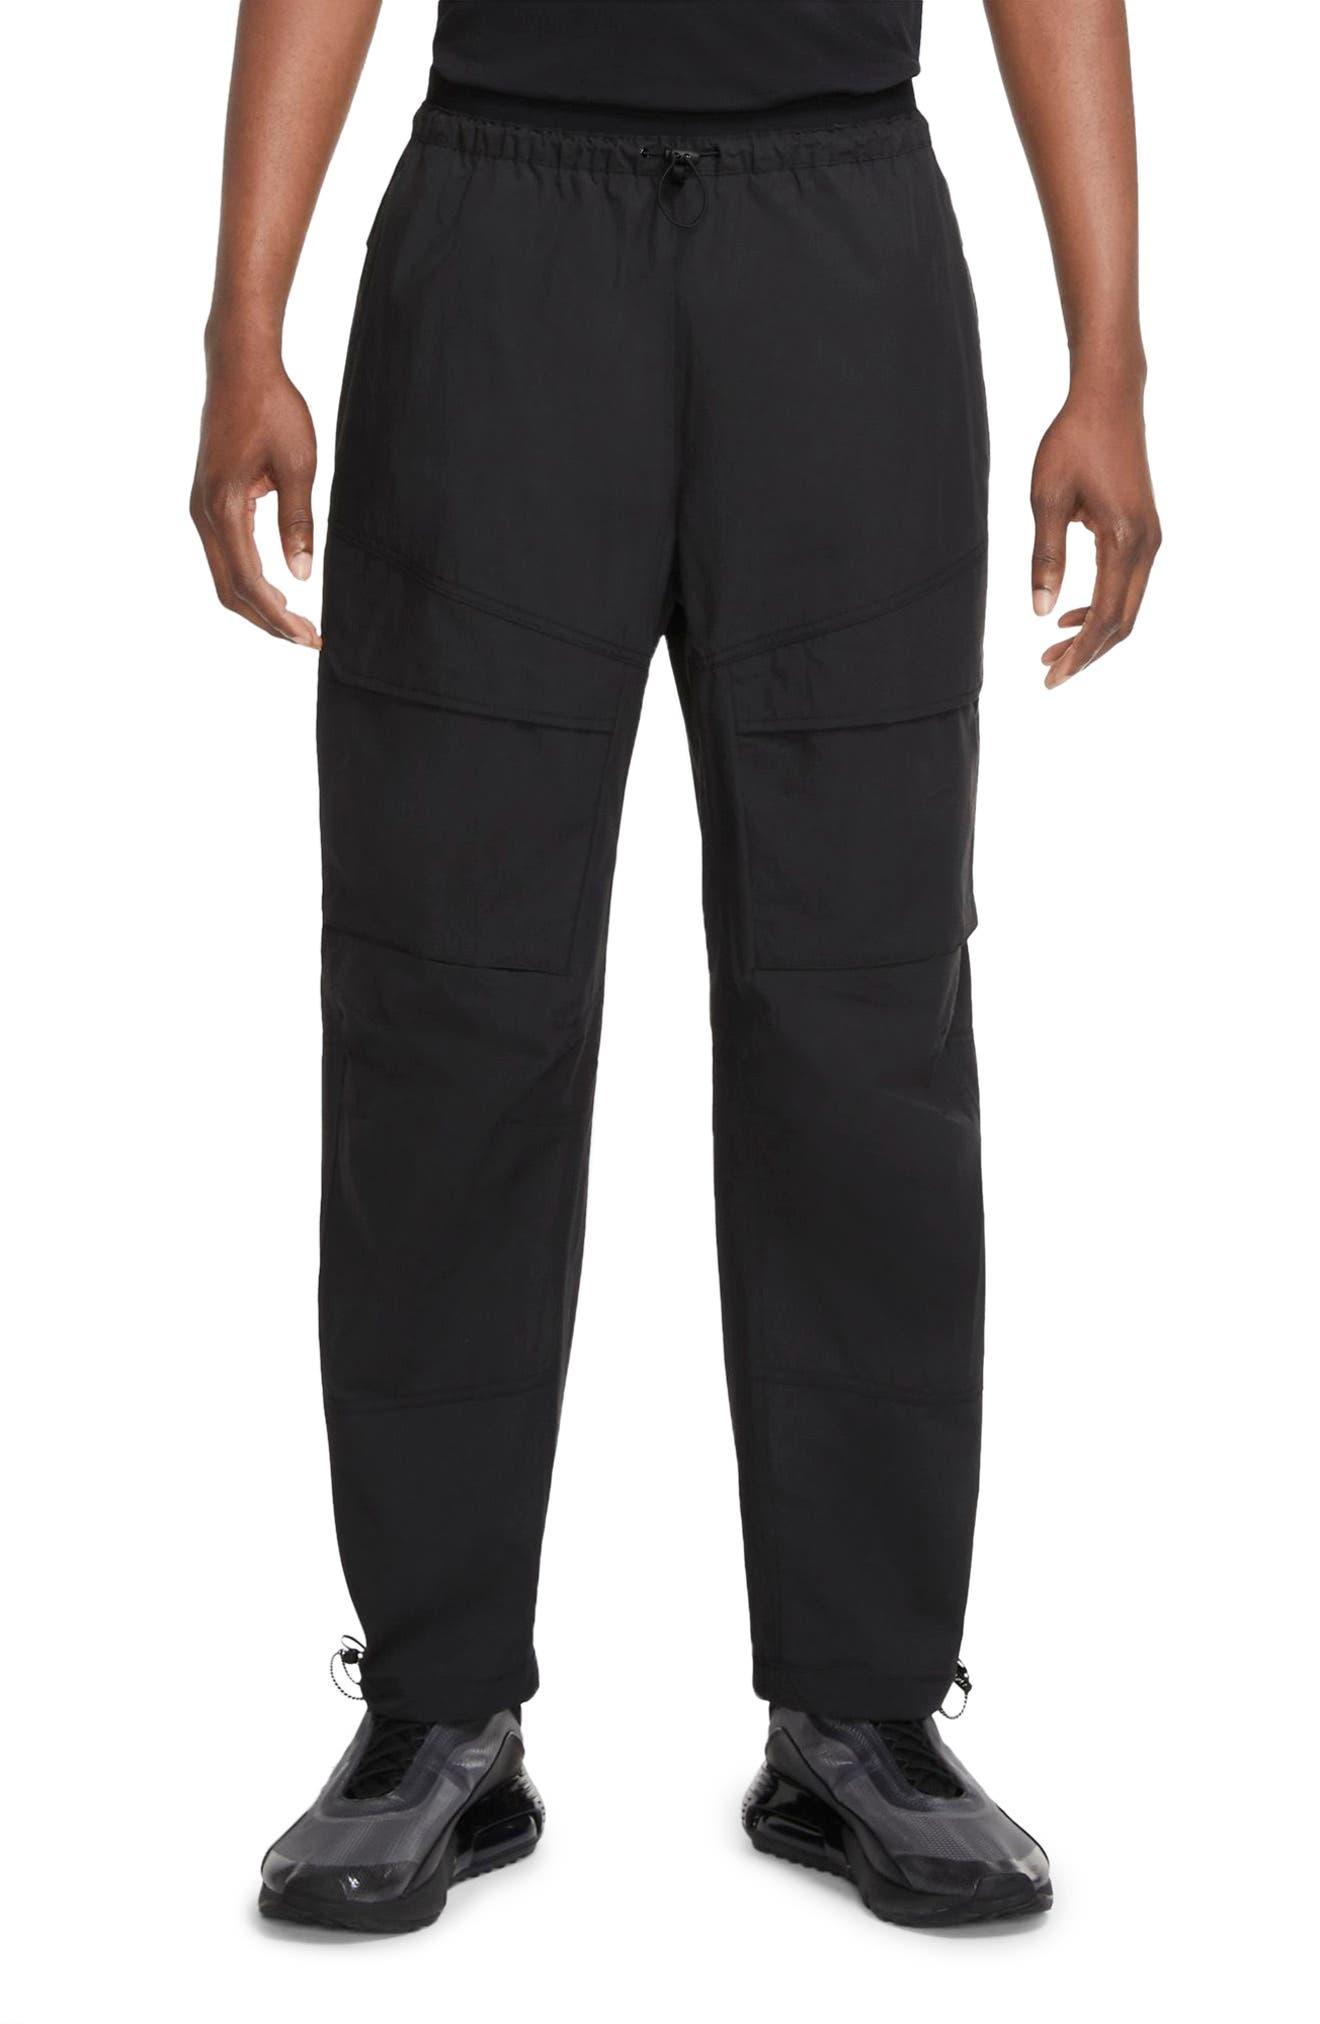 Men's Nike Tech Pack Woven Sweatpants